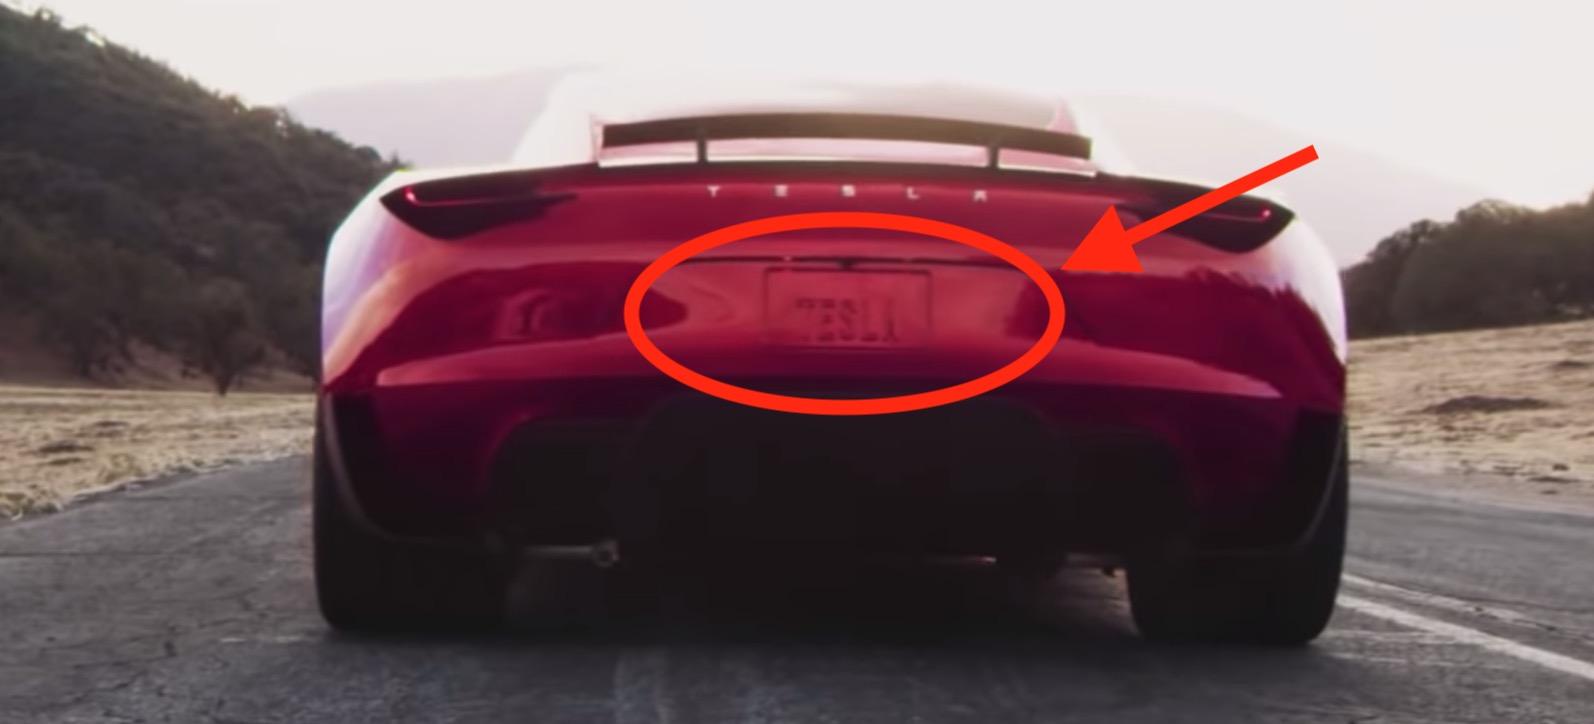 Uber Vehicle List >> Tesla Roadster's SpaceX thruster will be hidden behind the license plate, says Elon Musk - Electrek